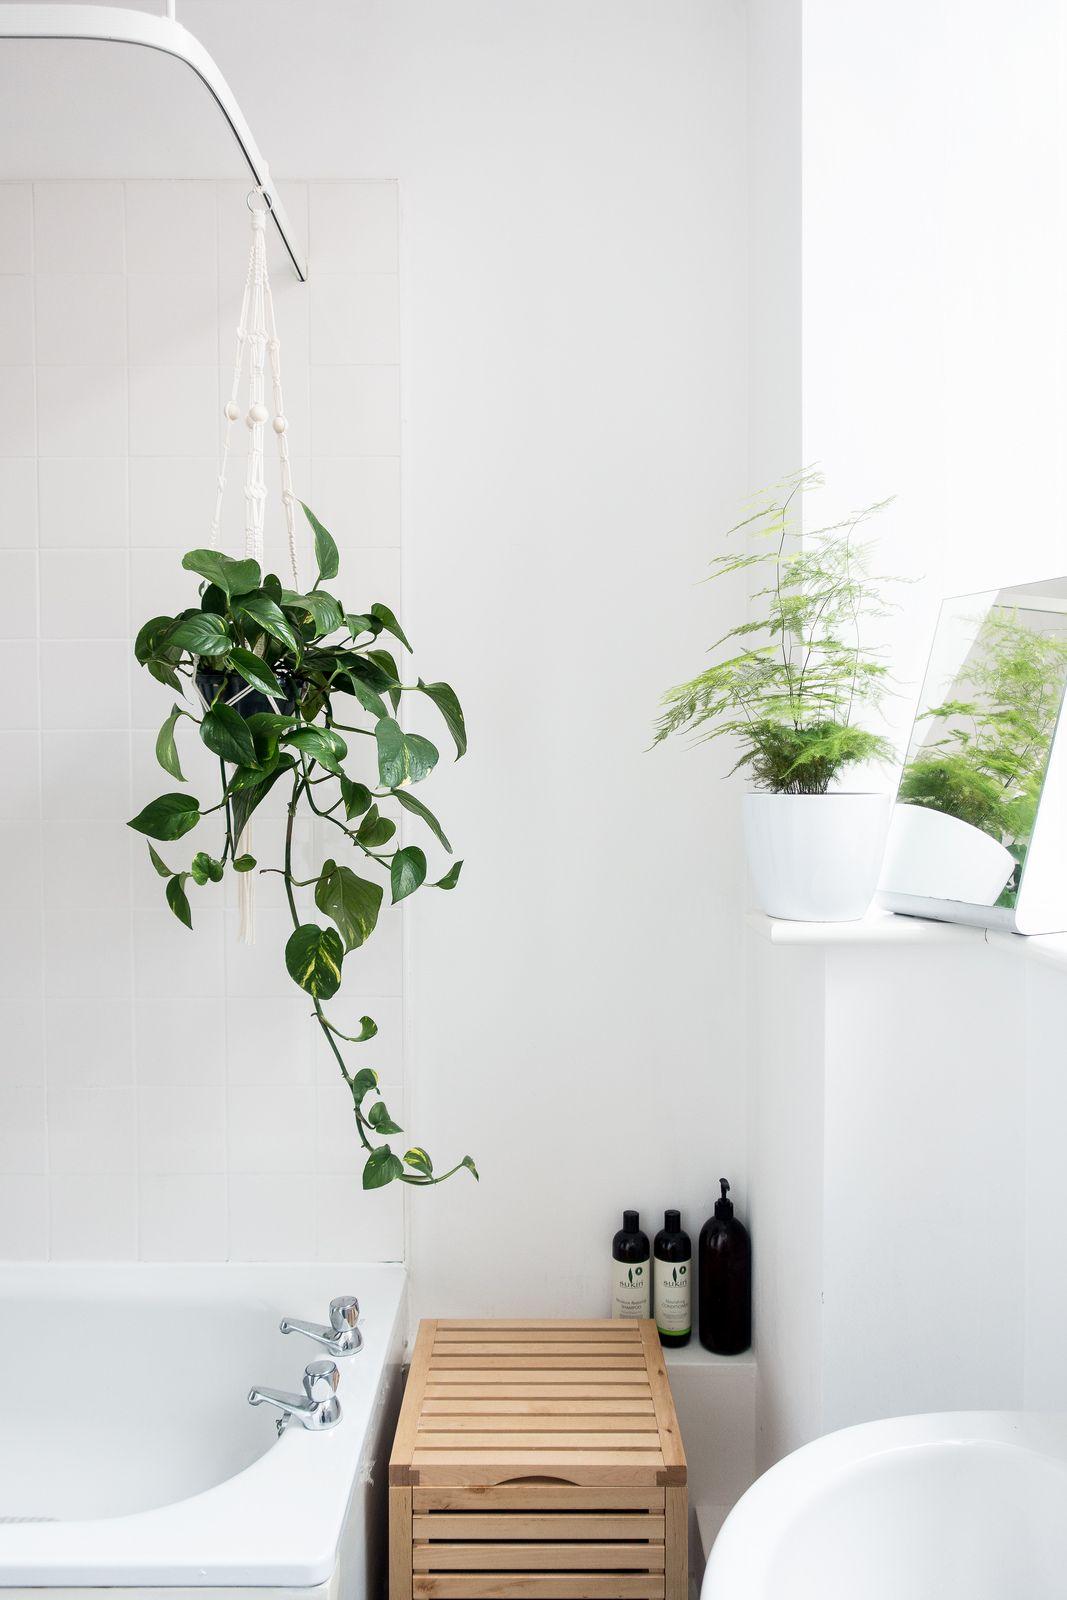 Theprivatelifeofagirl Com Nbsptheprivatelifeofagirl Resources And Information Easy Bathroom Updates Shower Plant Simple Bathroom